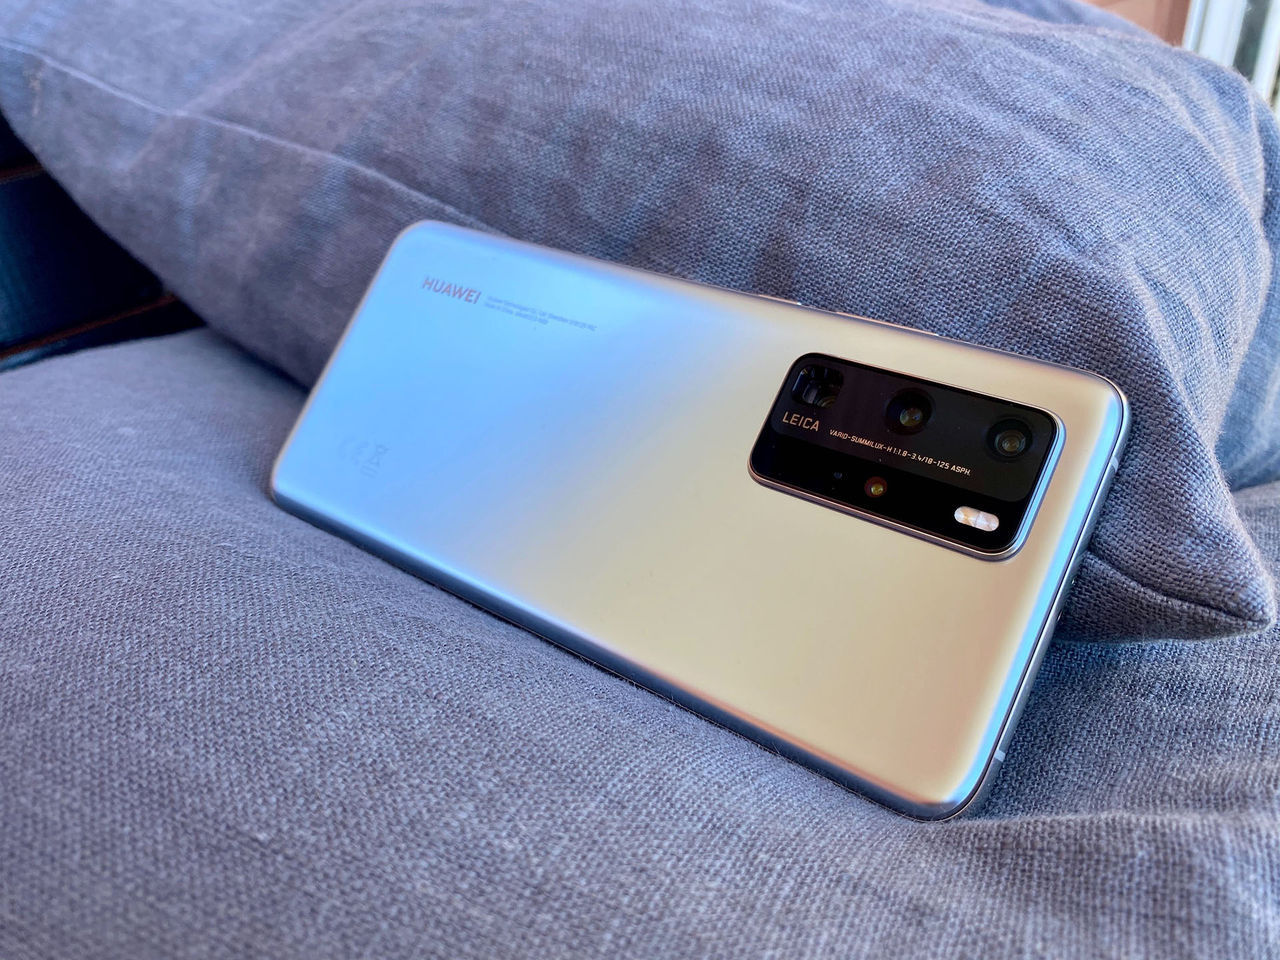 Kinesiska ambassaden gillar inte Säpos Huawei-kritik